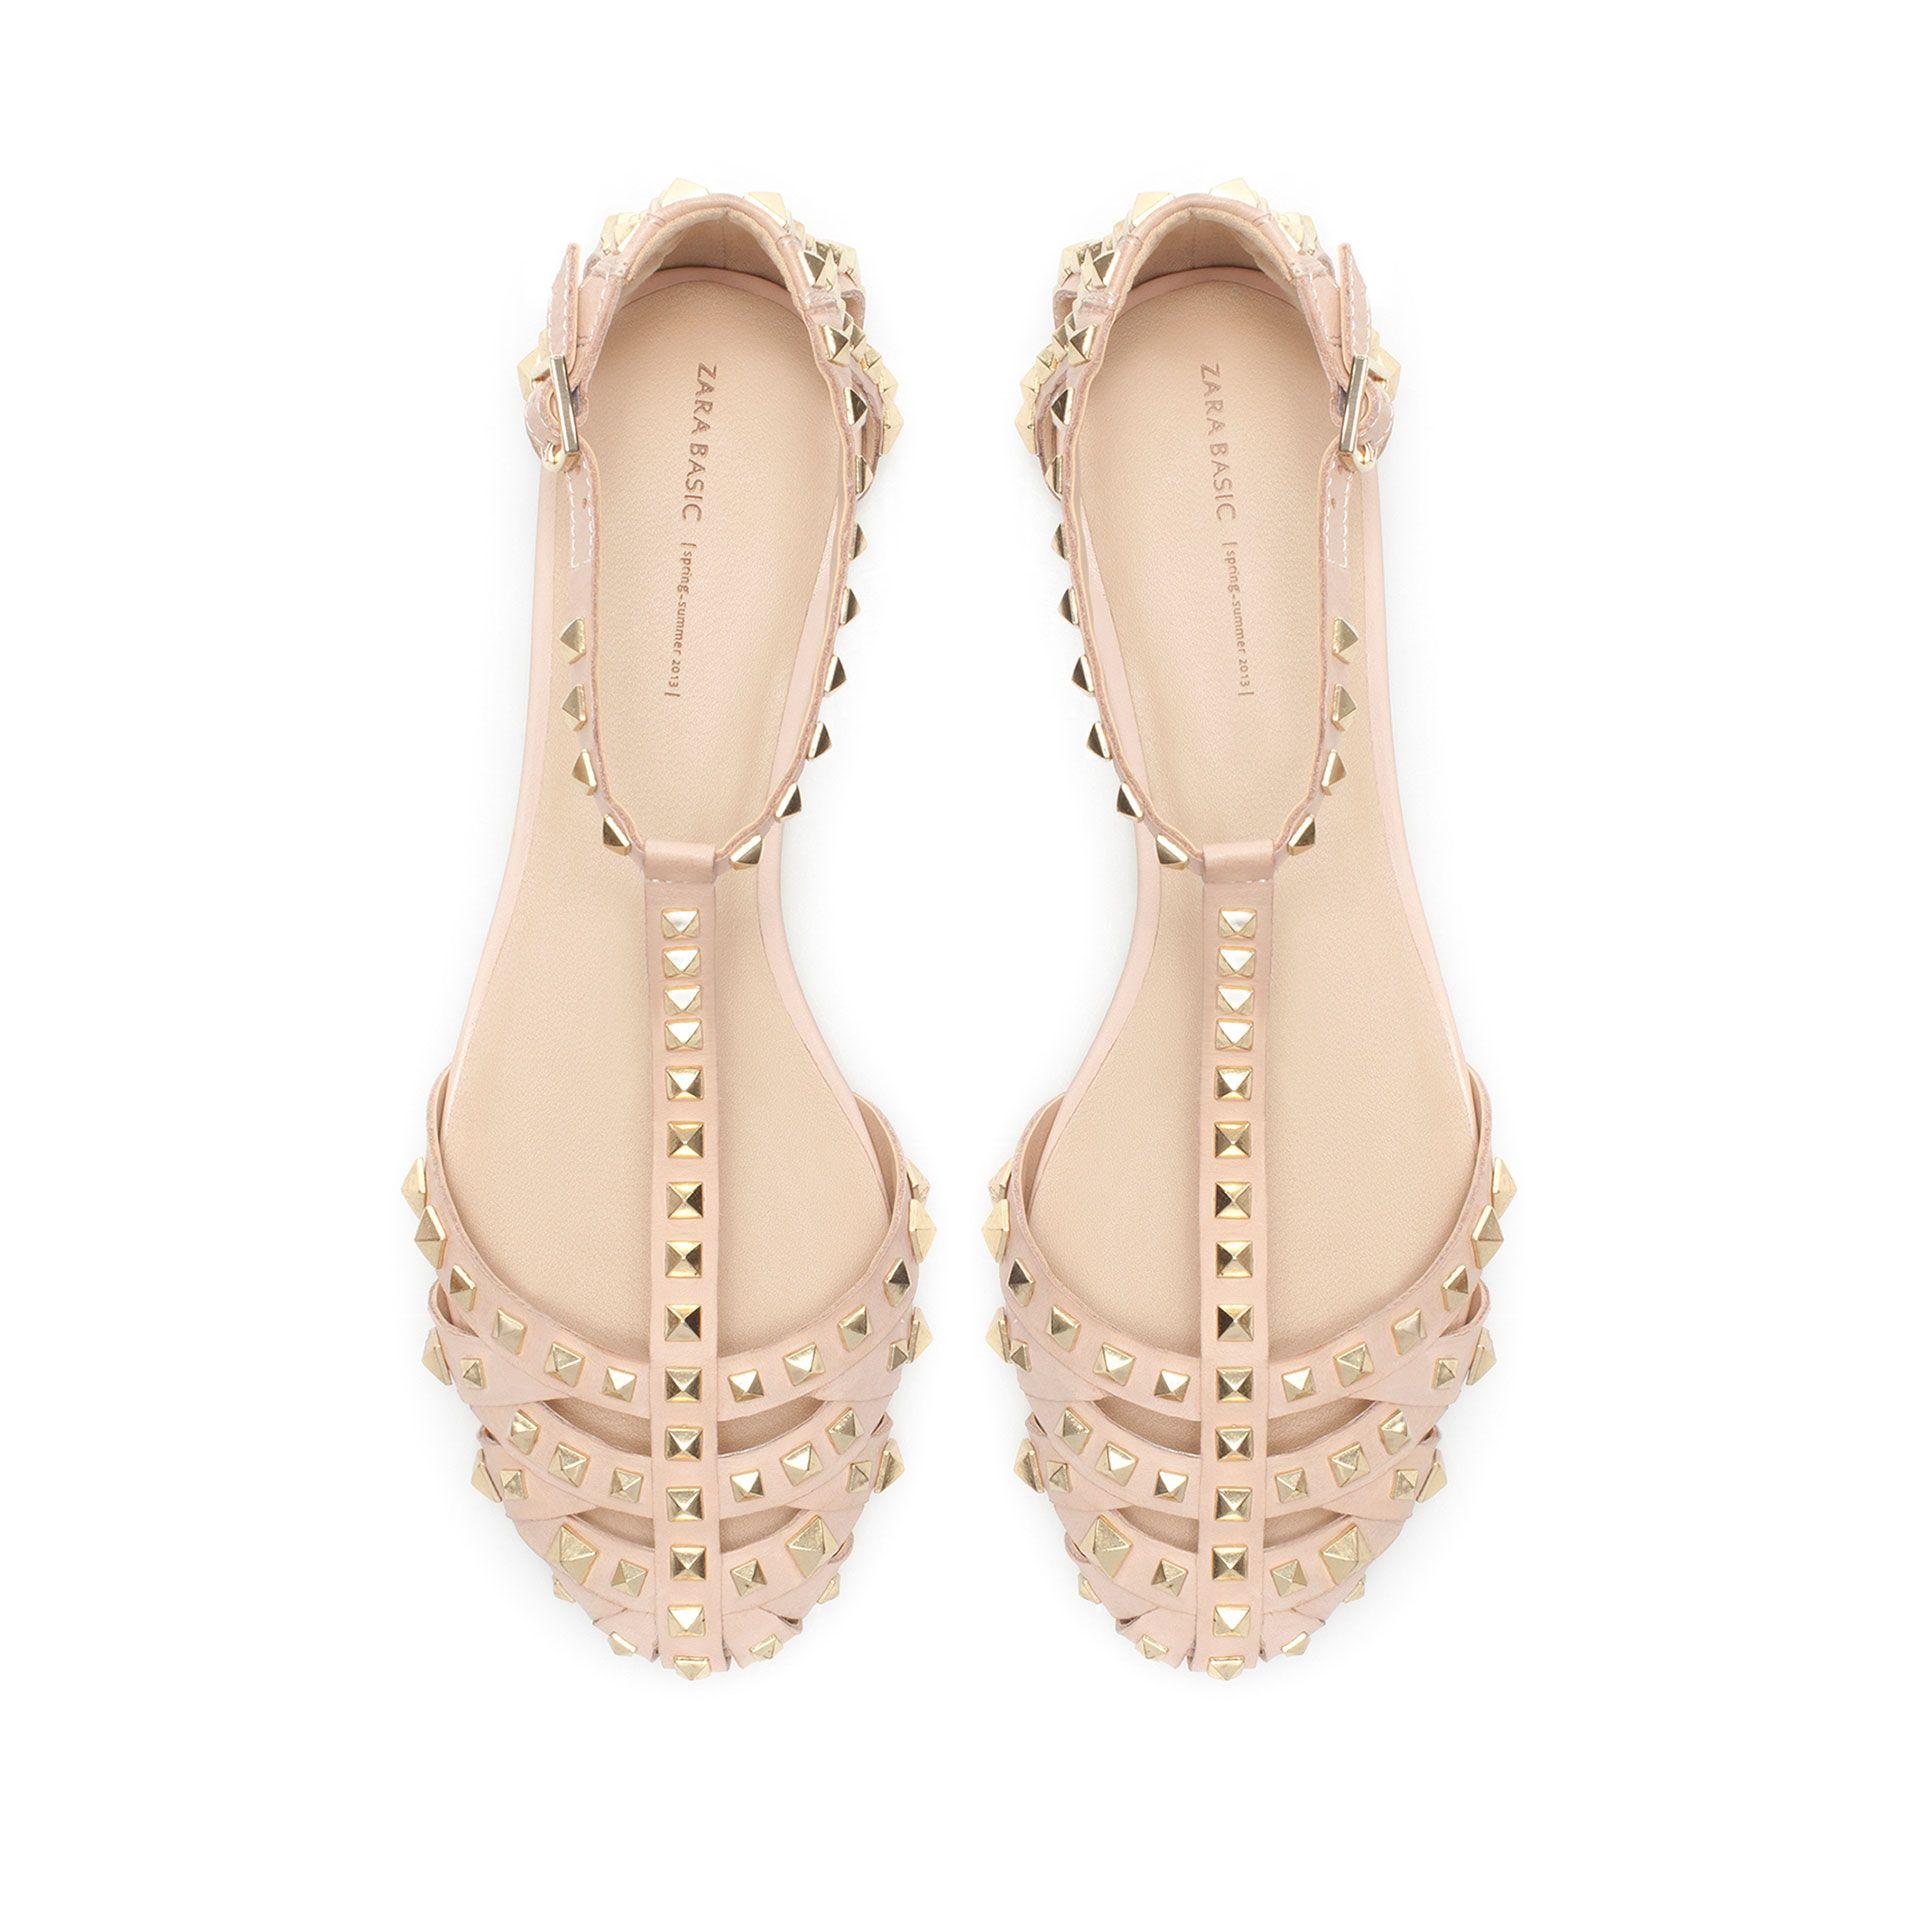 be8071dd ZARA #zapatos #novia #boda   ▴Zapatos novia▴   Zapatos pump ...